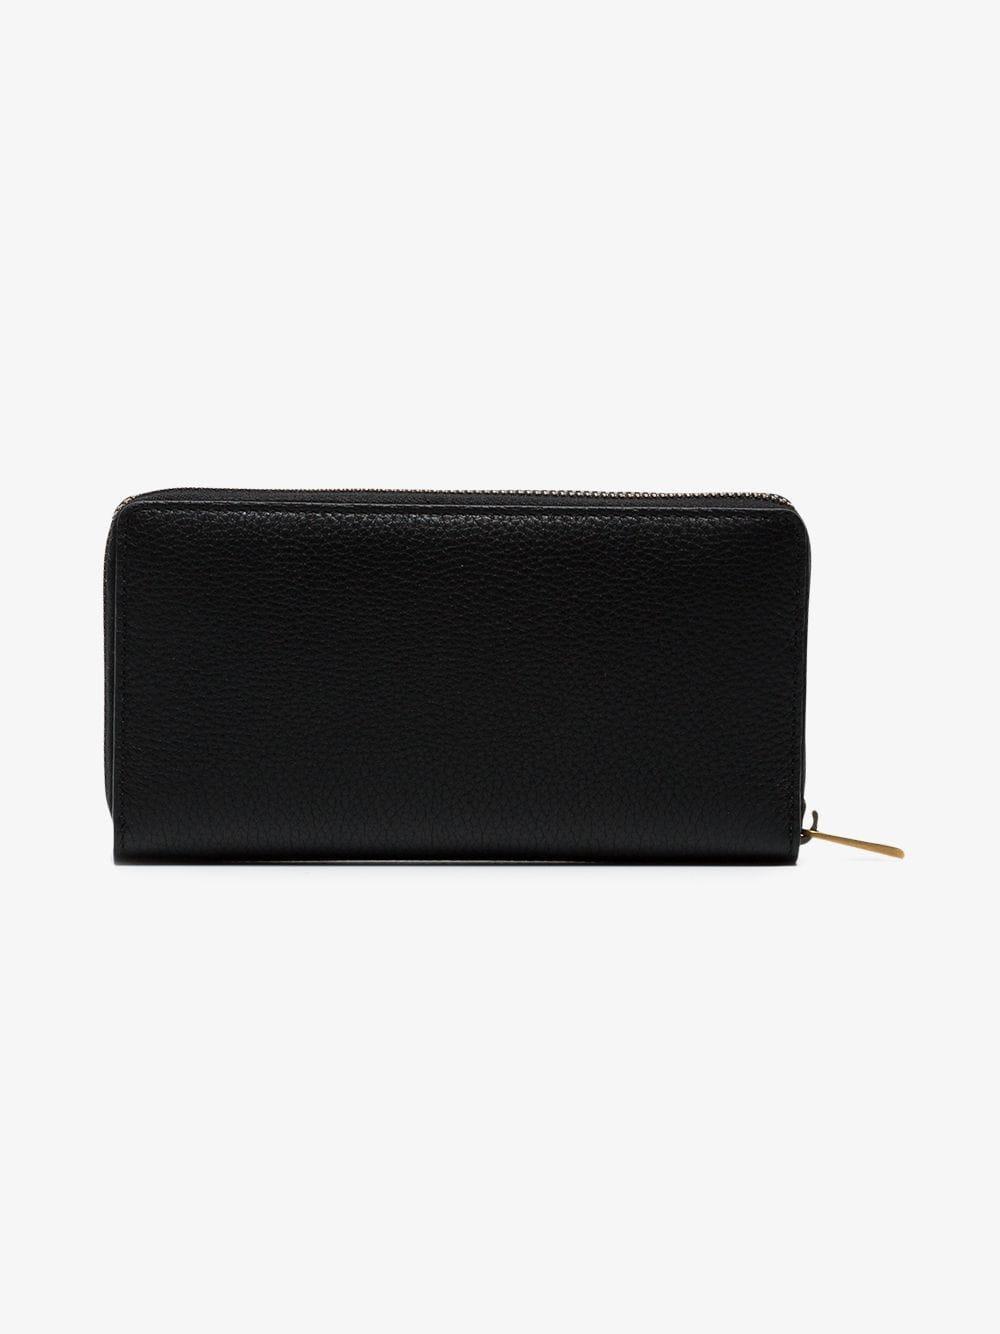 7cf5f6b97dc84d Lyst - Gucci Black Logo Leather Zip Around Wallet in Black